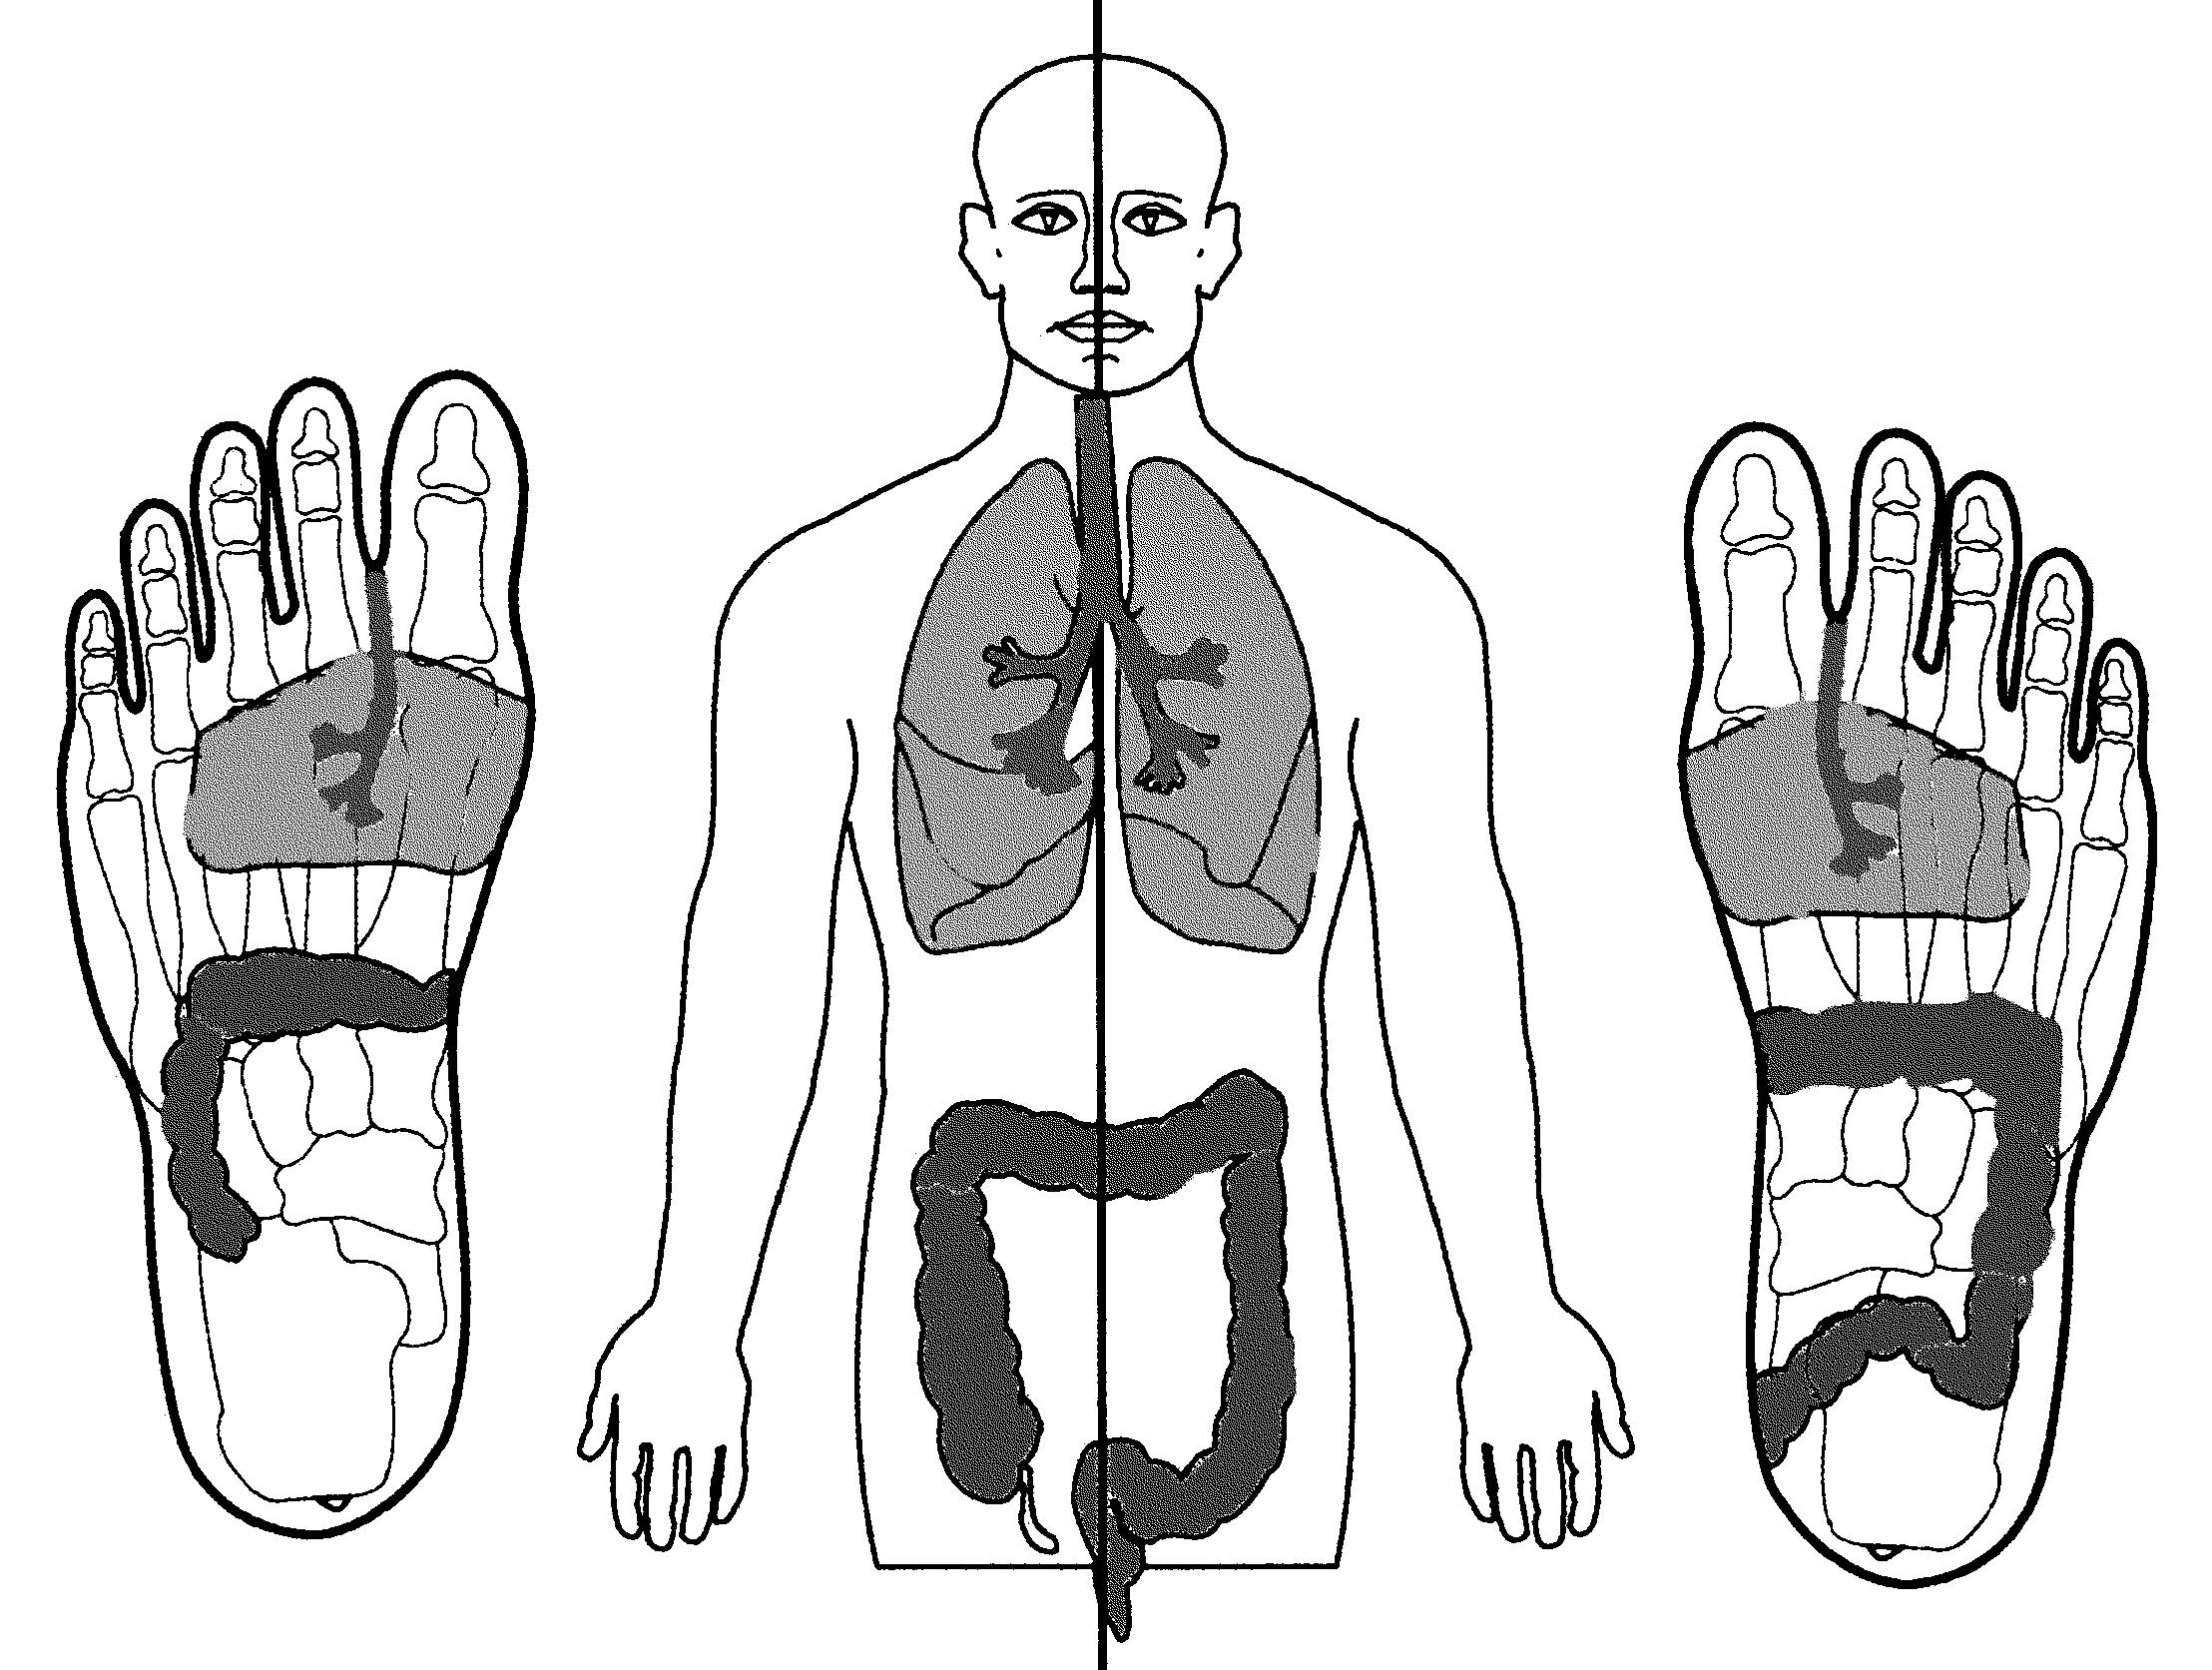 Fussreflexzonen - Organ-Entsprechung